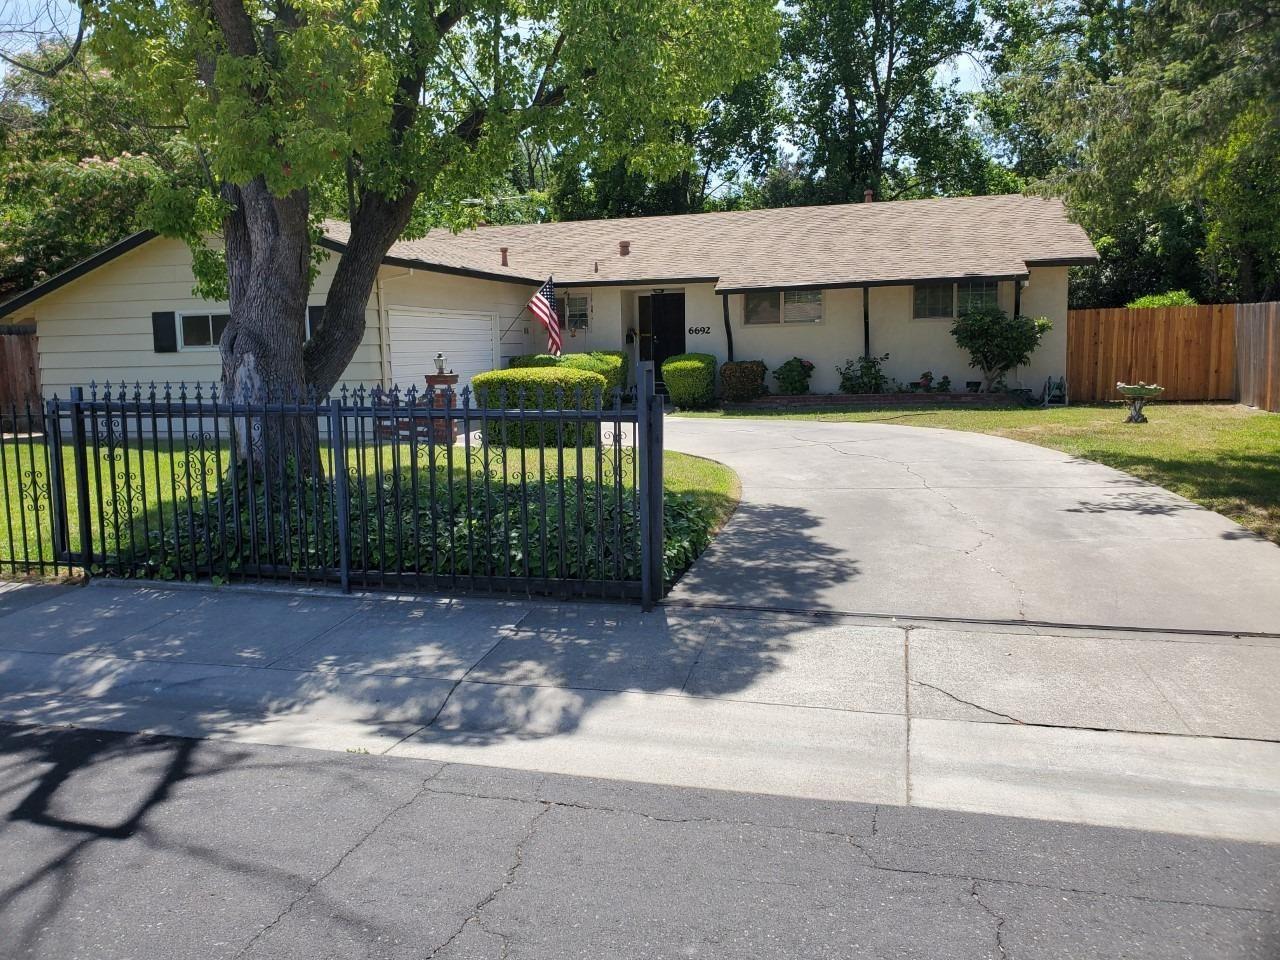 6692 Heatherwood Way, Sacramento, CA 95831 - MLS#: 221060456